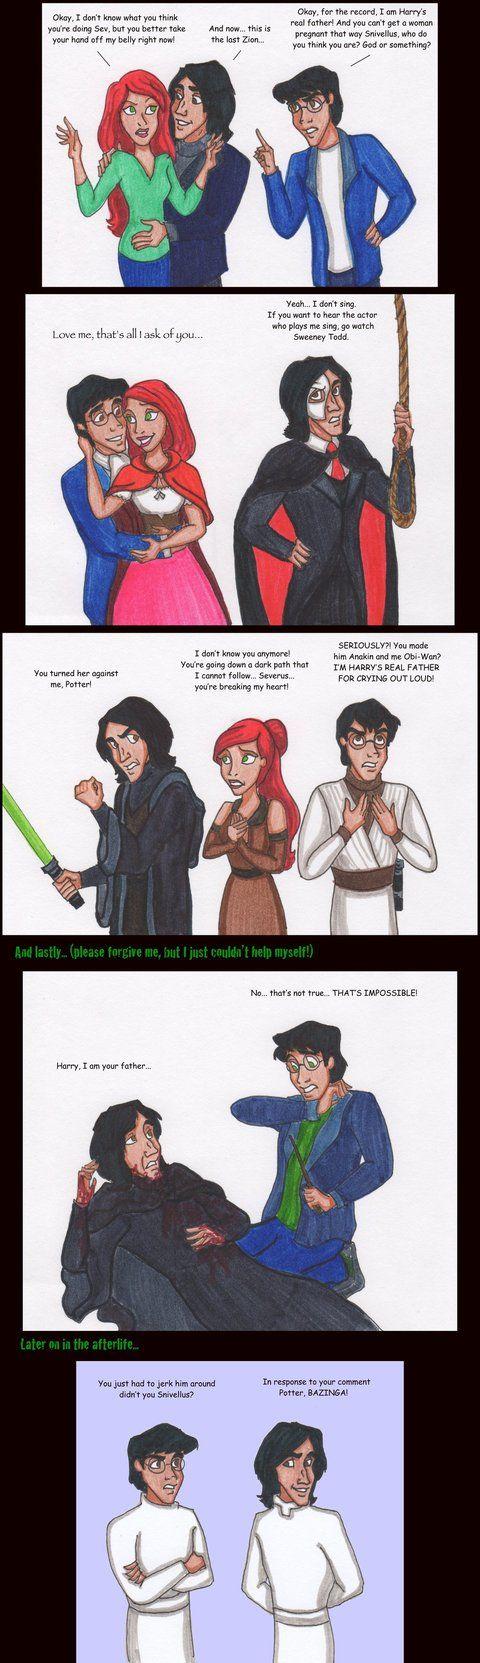 Snape meme part 6 by DKCissner on DeviantArt